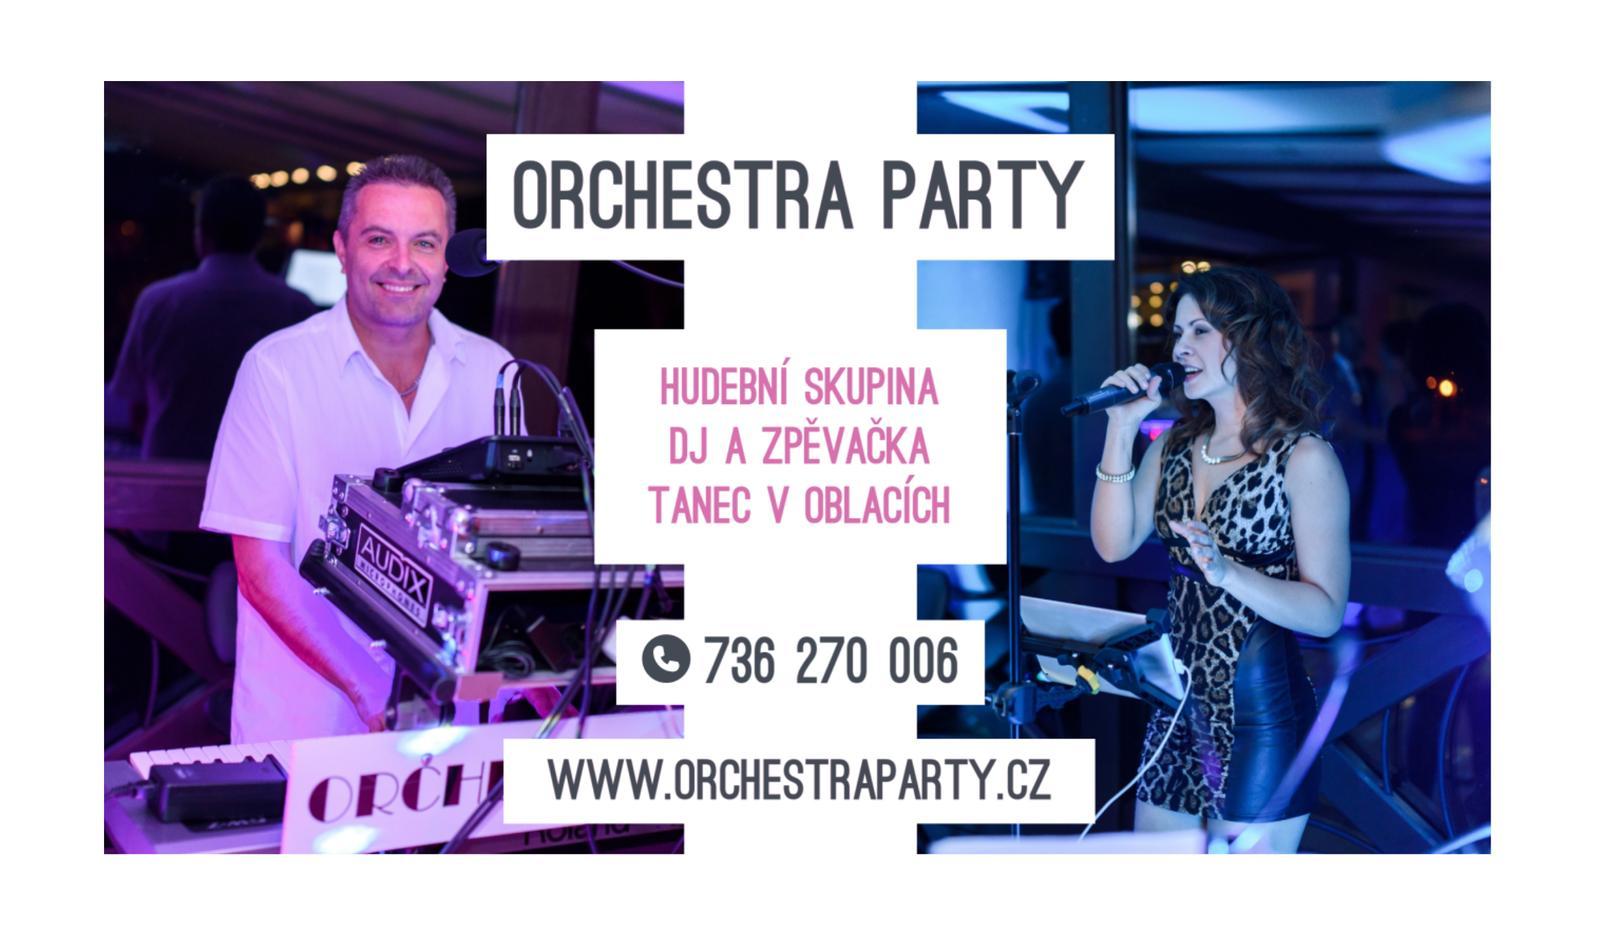 orchestraparty - Vizitka 2020